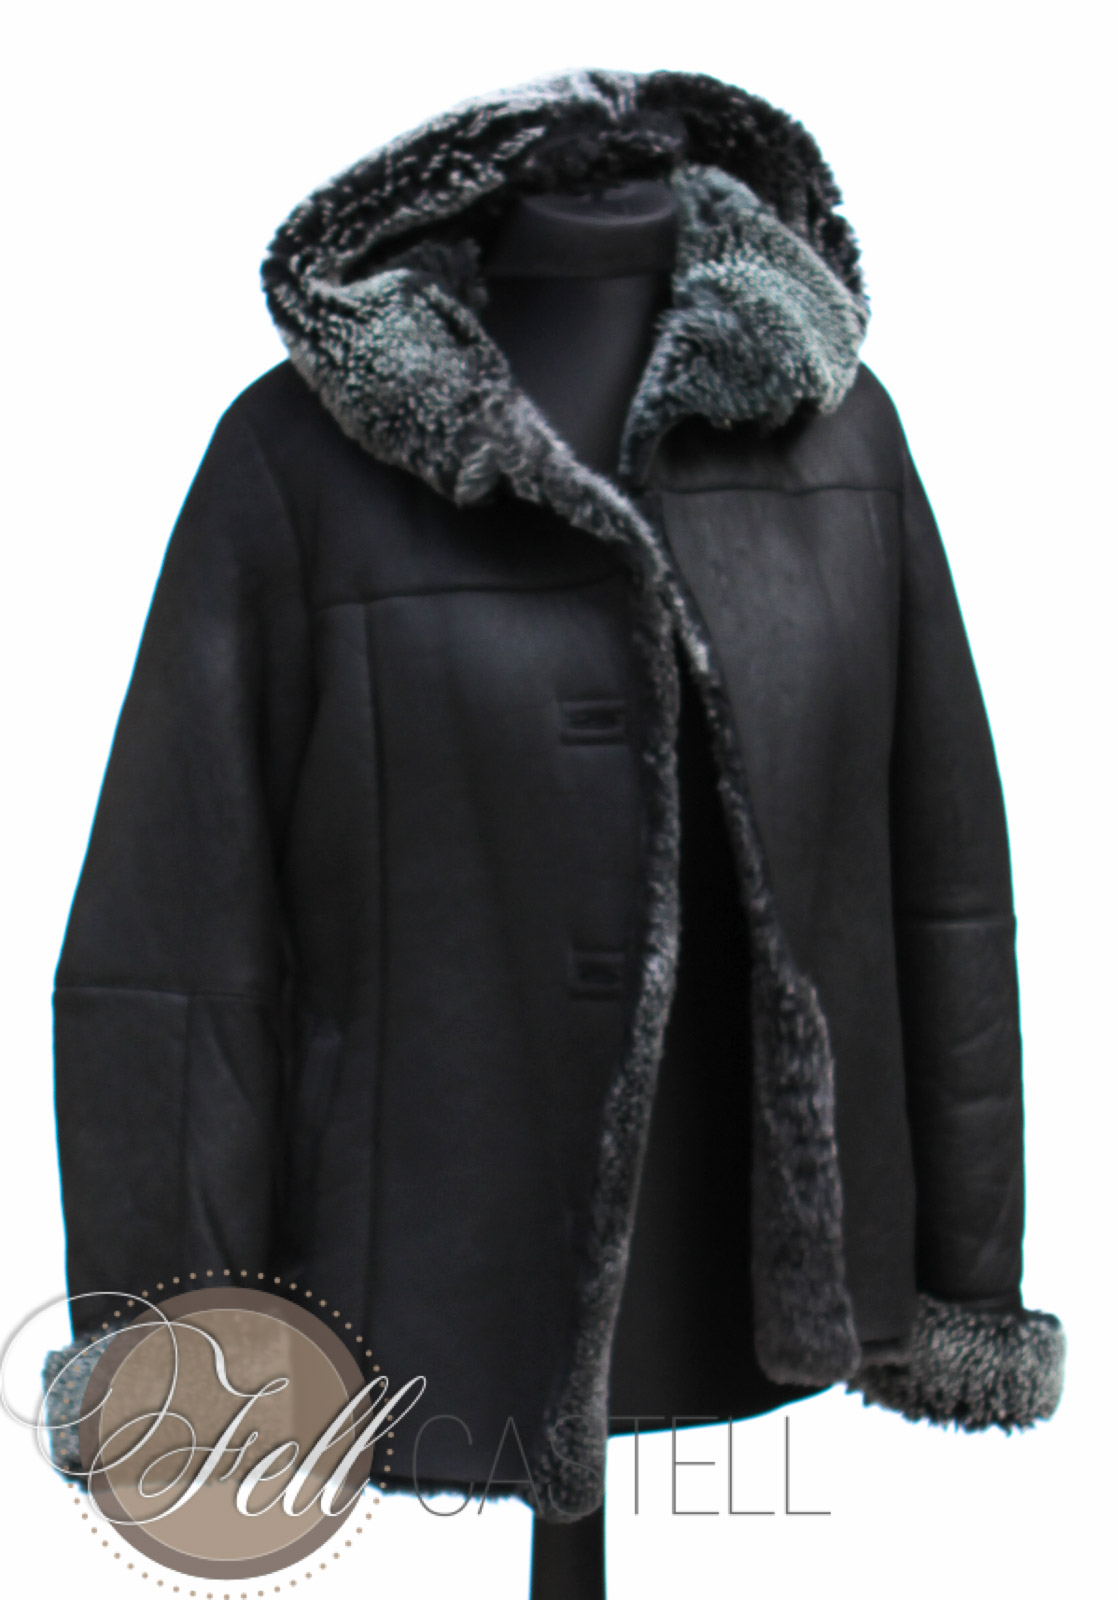 lammfelljacke kapuzenjacke damen schwarz gr 40 lammfell schaffell shop. Black Bedroom Furniture Sets. Home Design Ideas